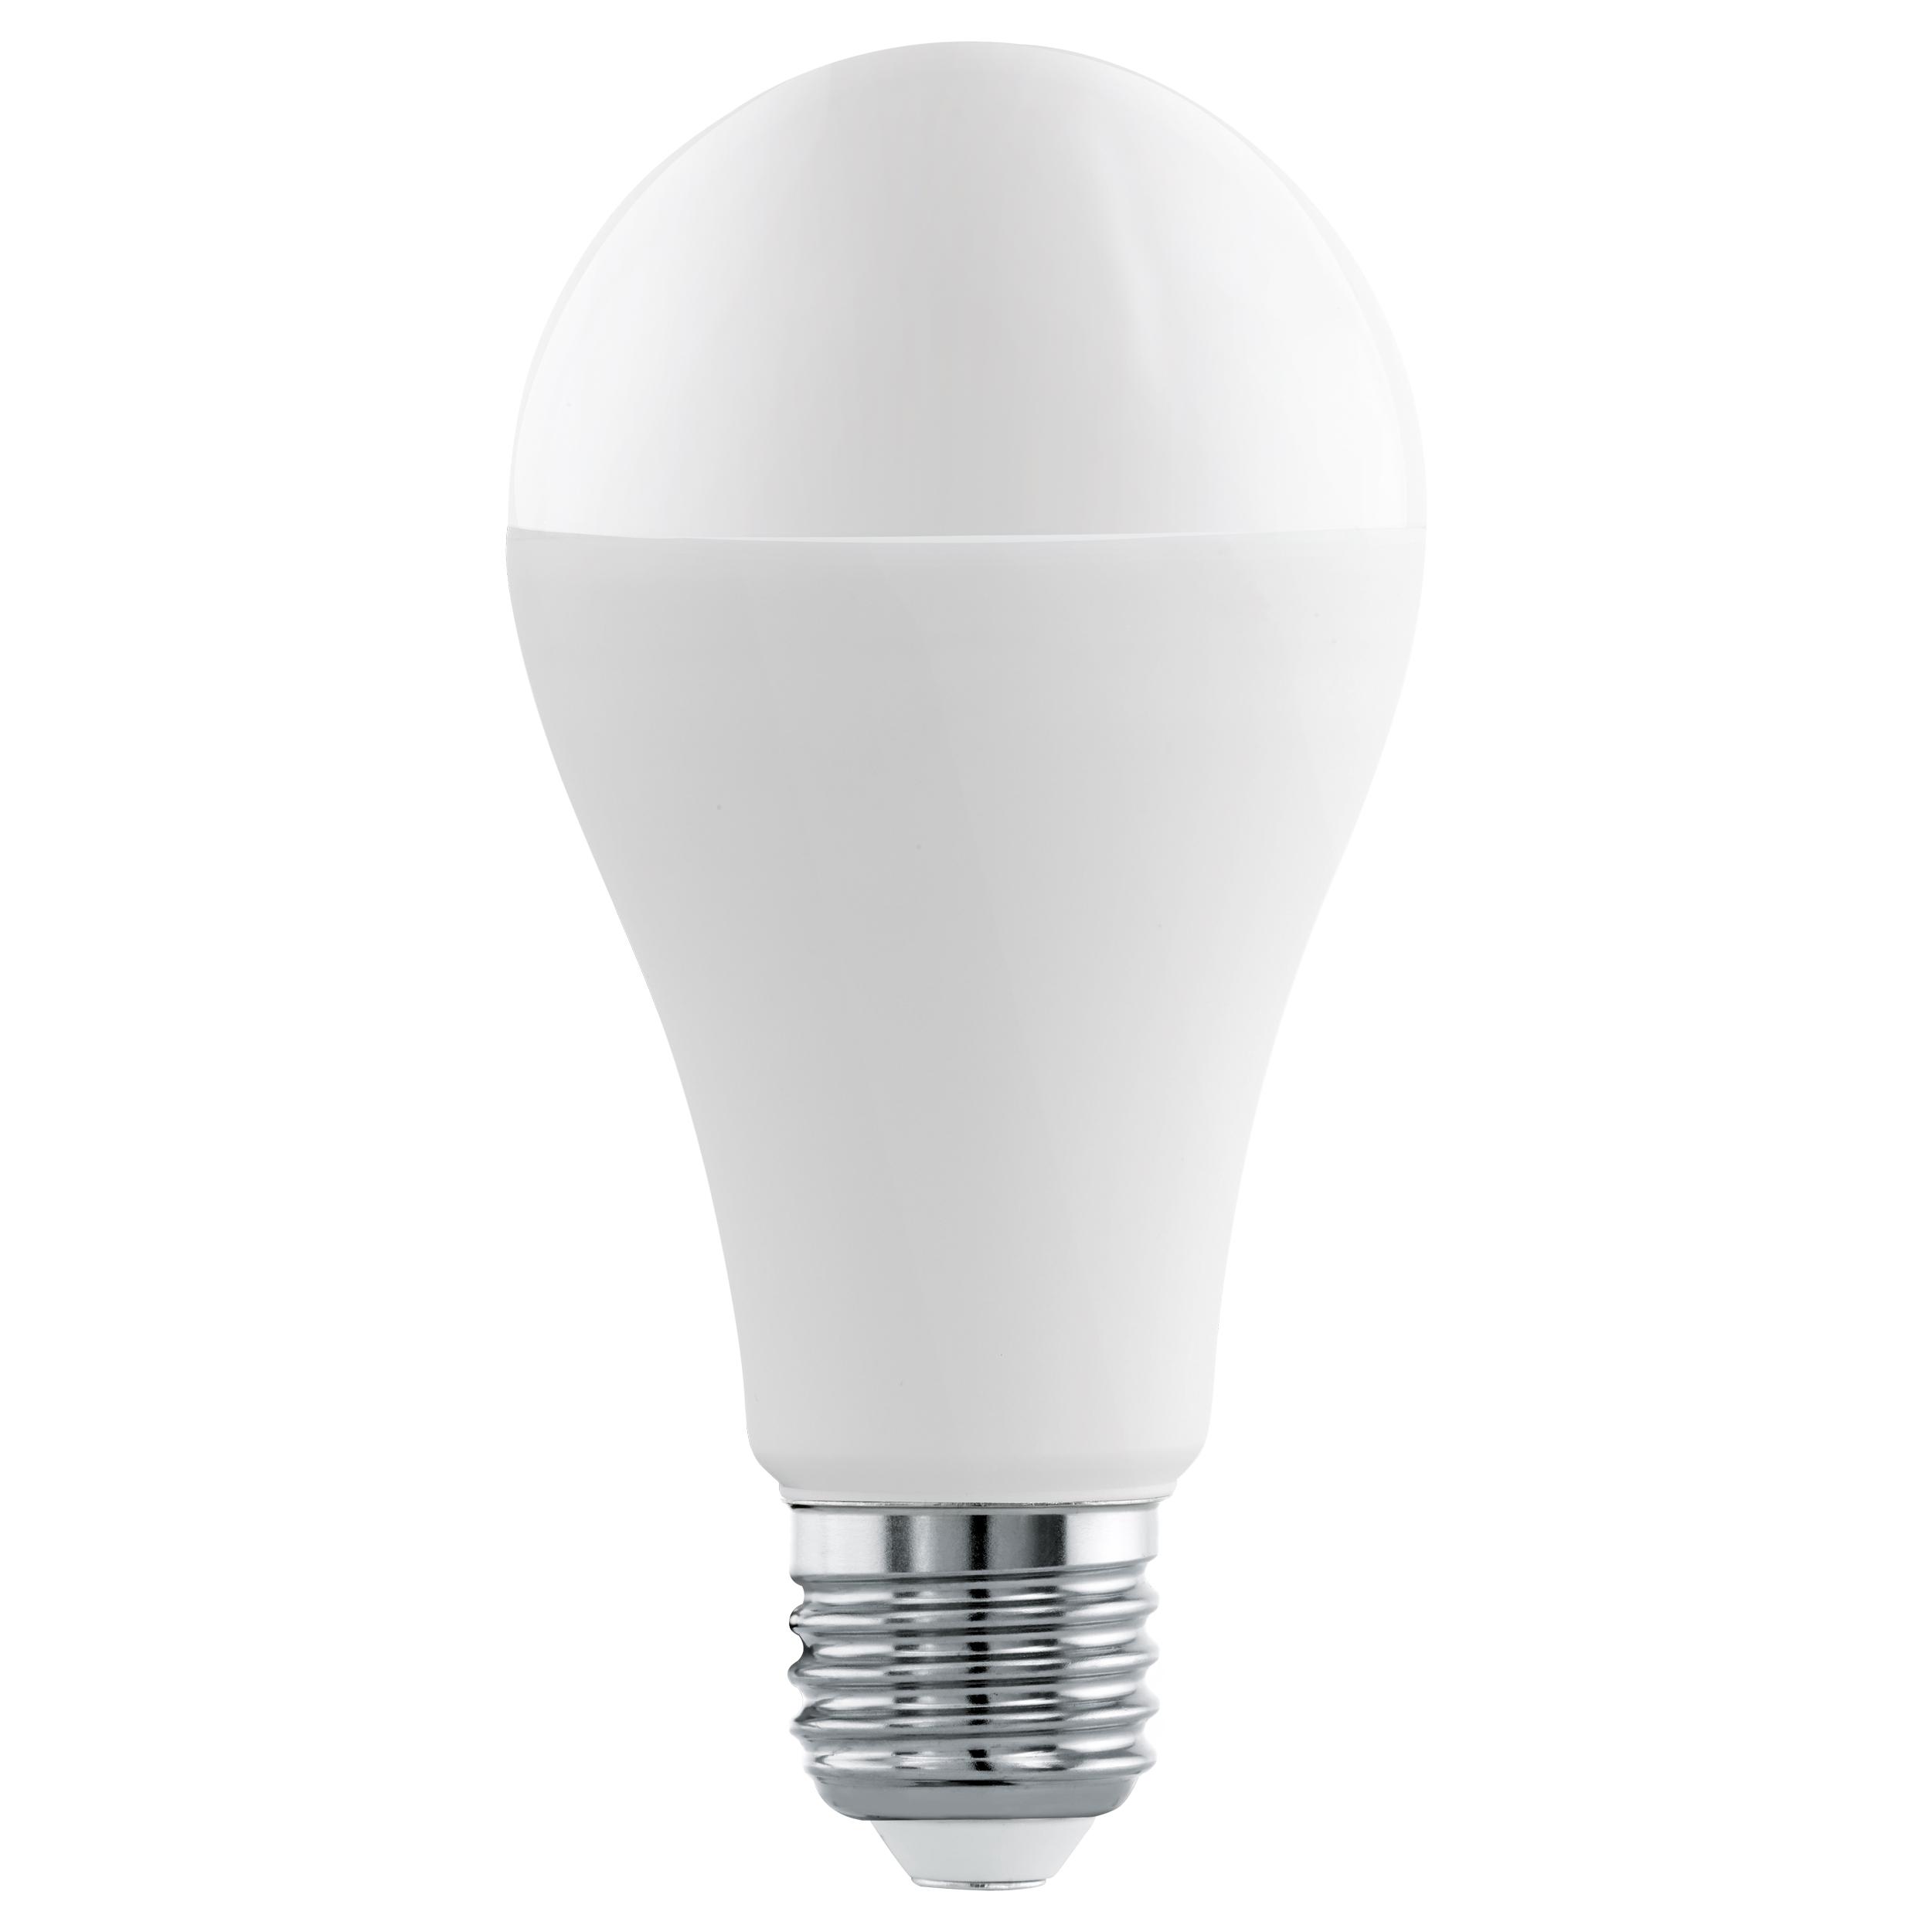 Bec LED Eglo 11564 E27 16W 1521 lumeni 4000K 15.000 ore alb neutru poza